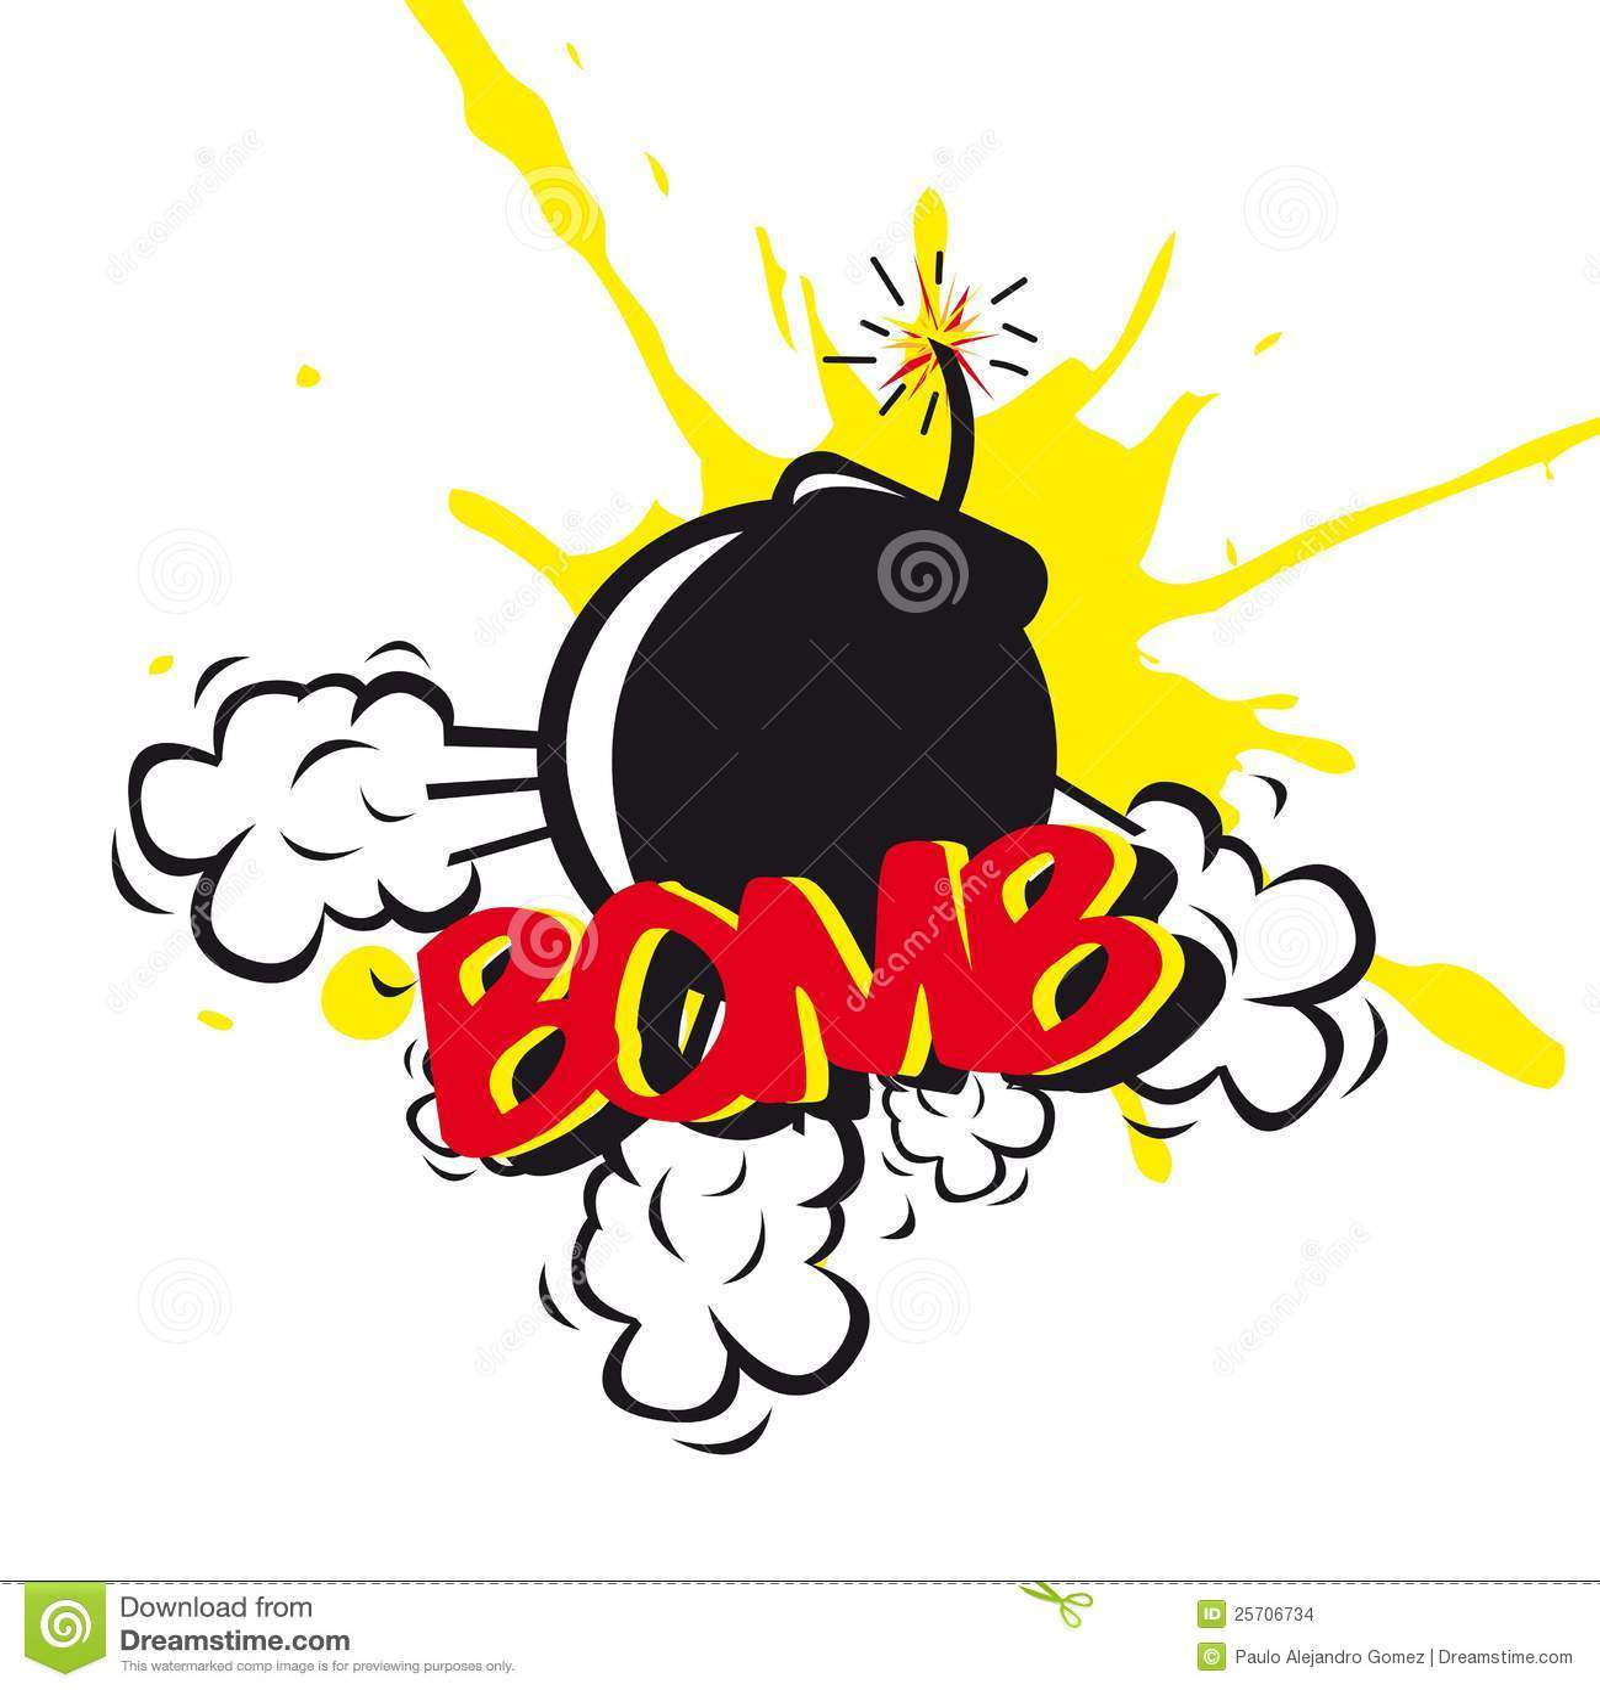 Bomb comic over white background. illustration.